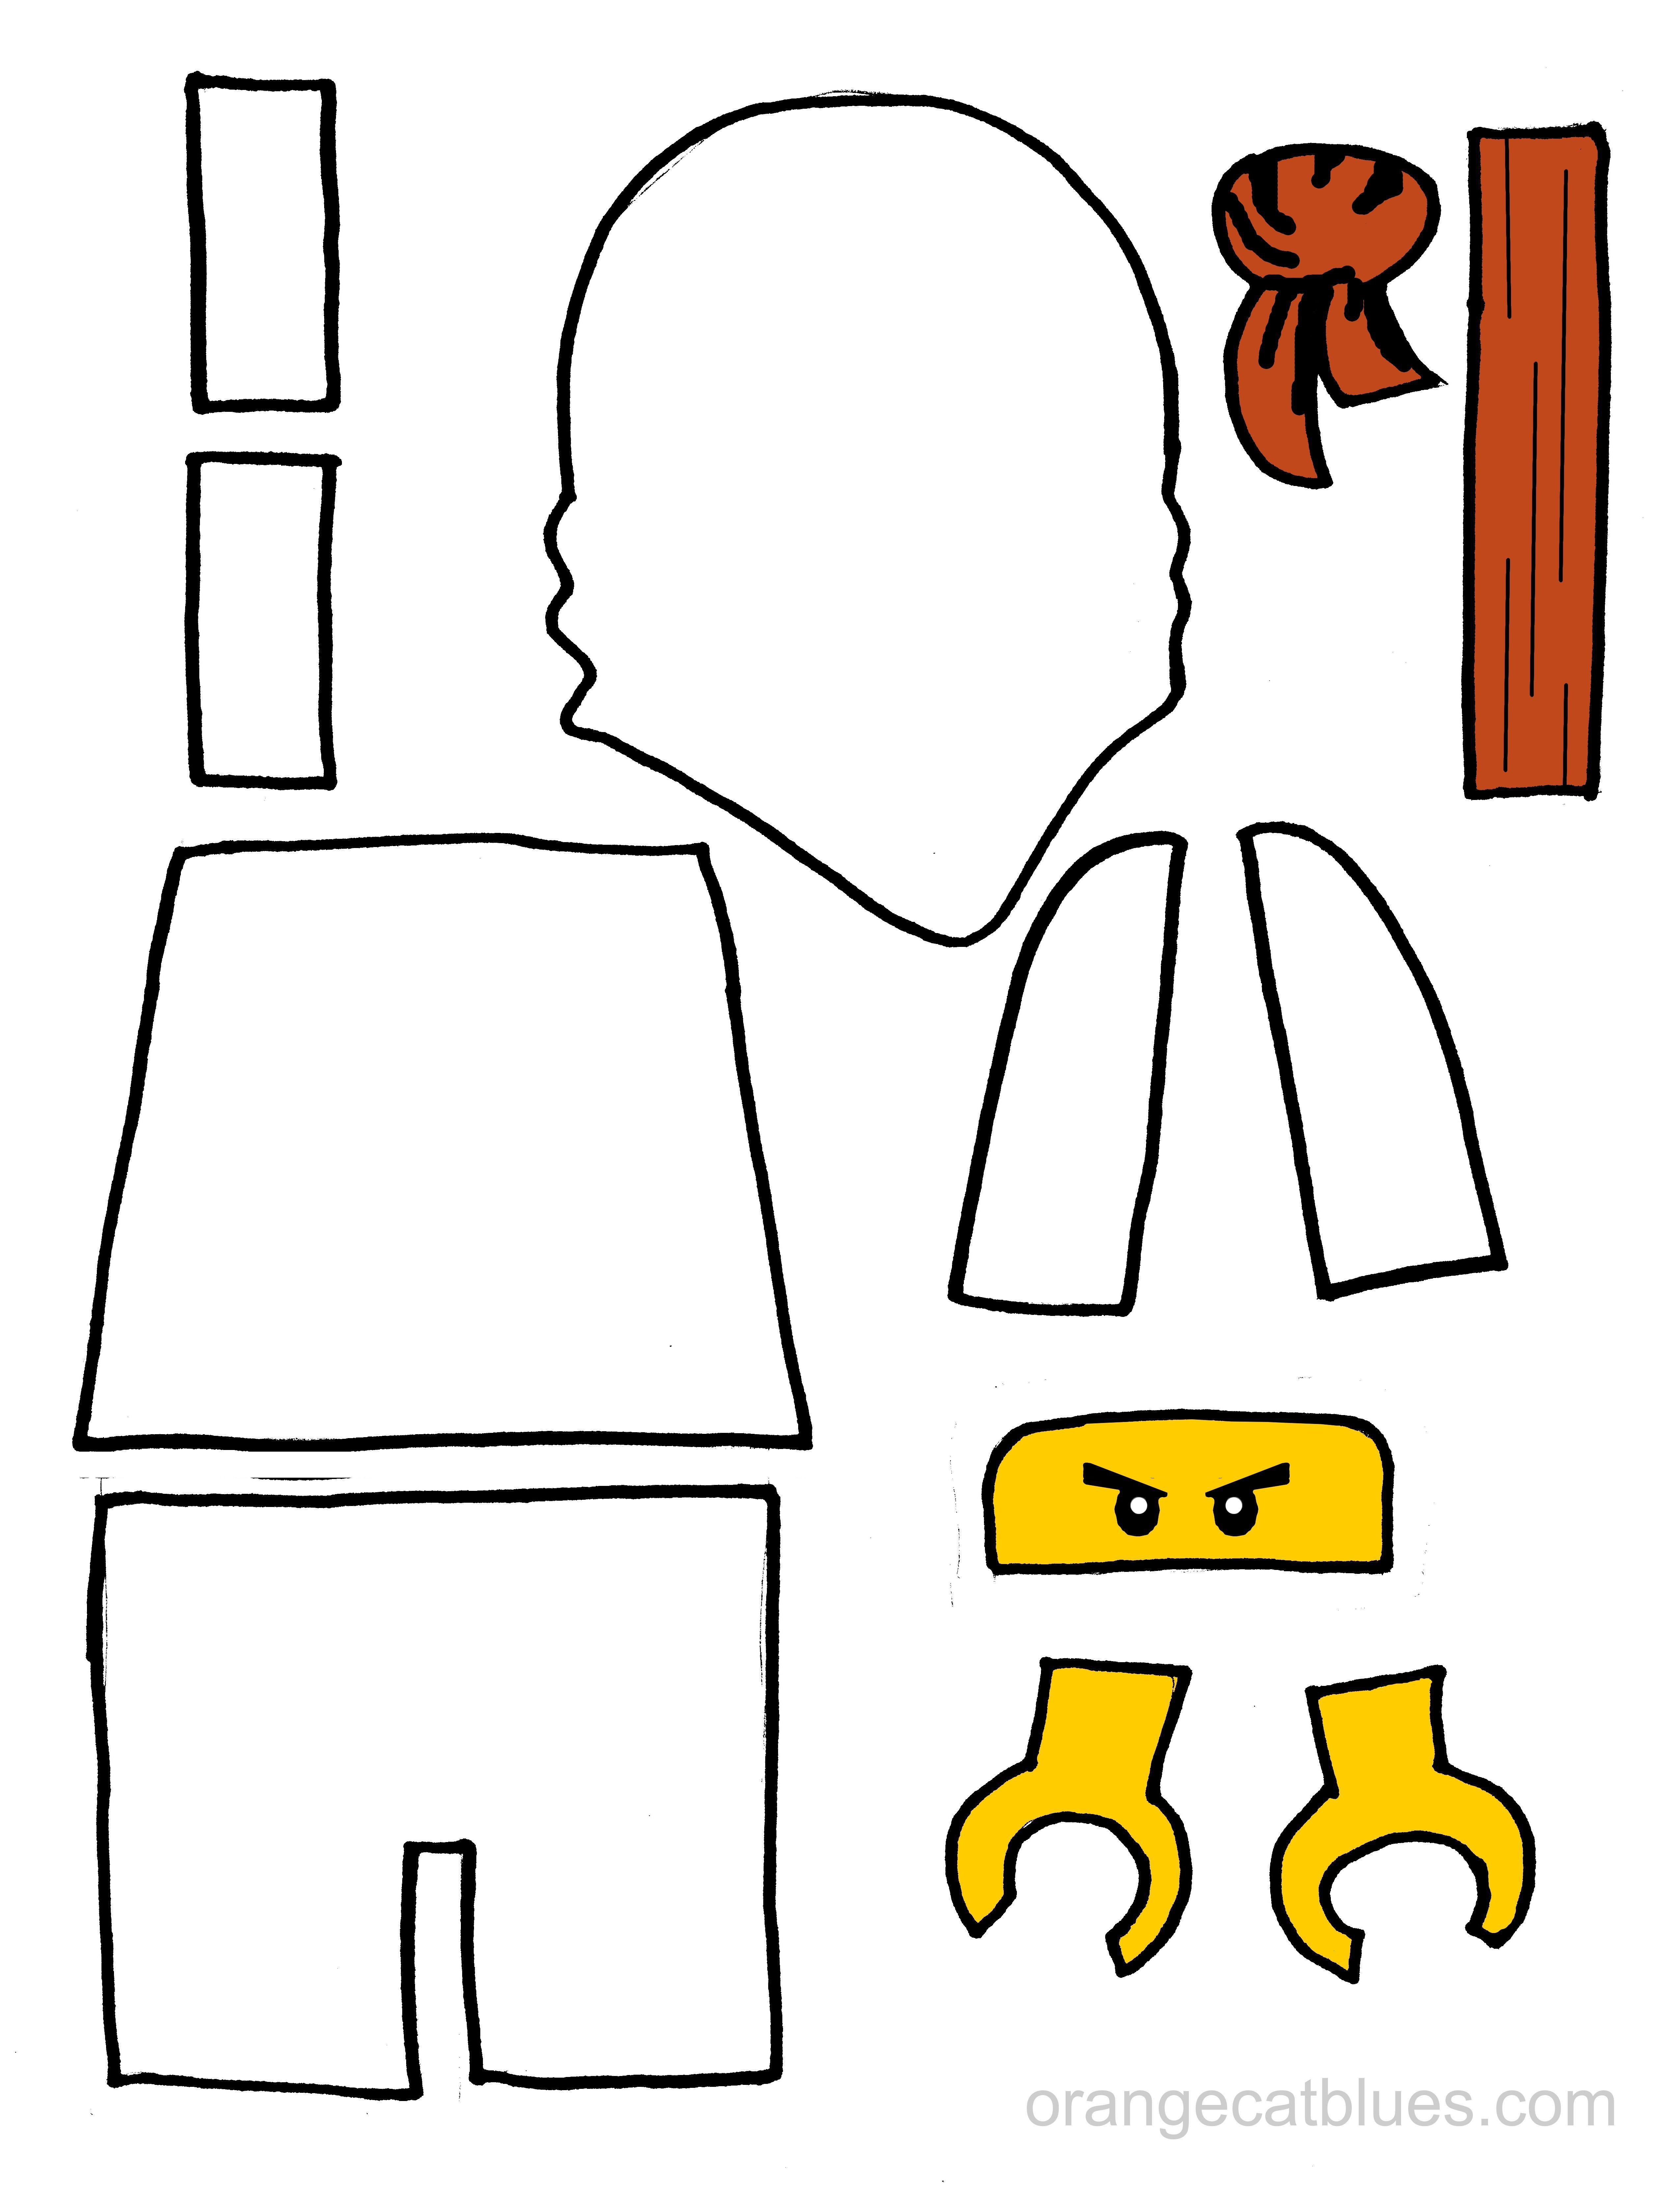 5100x6641 Lego Ninjago Printable Cutout For Toddler Gluestick Art The White